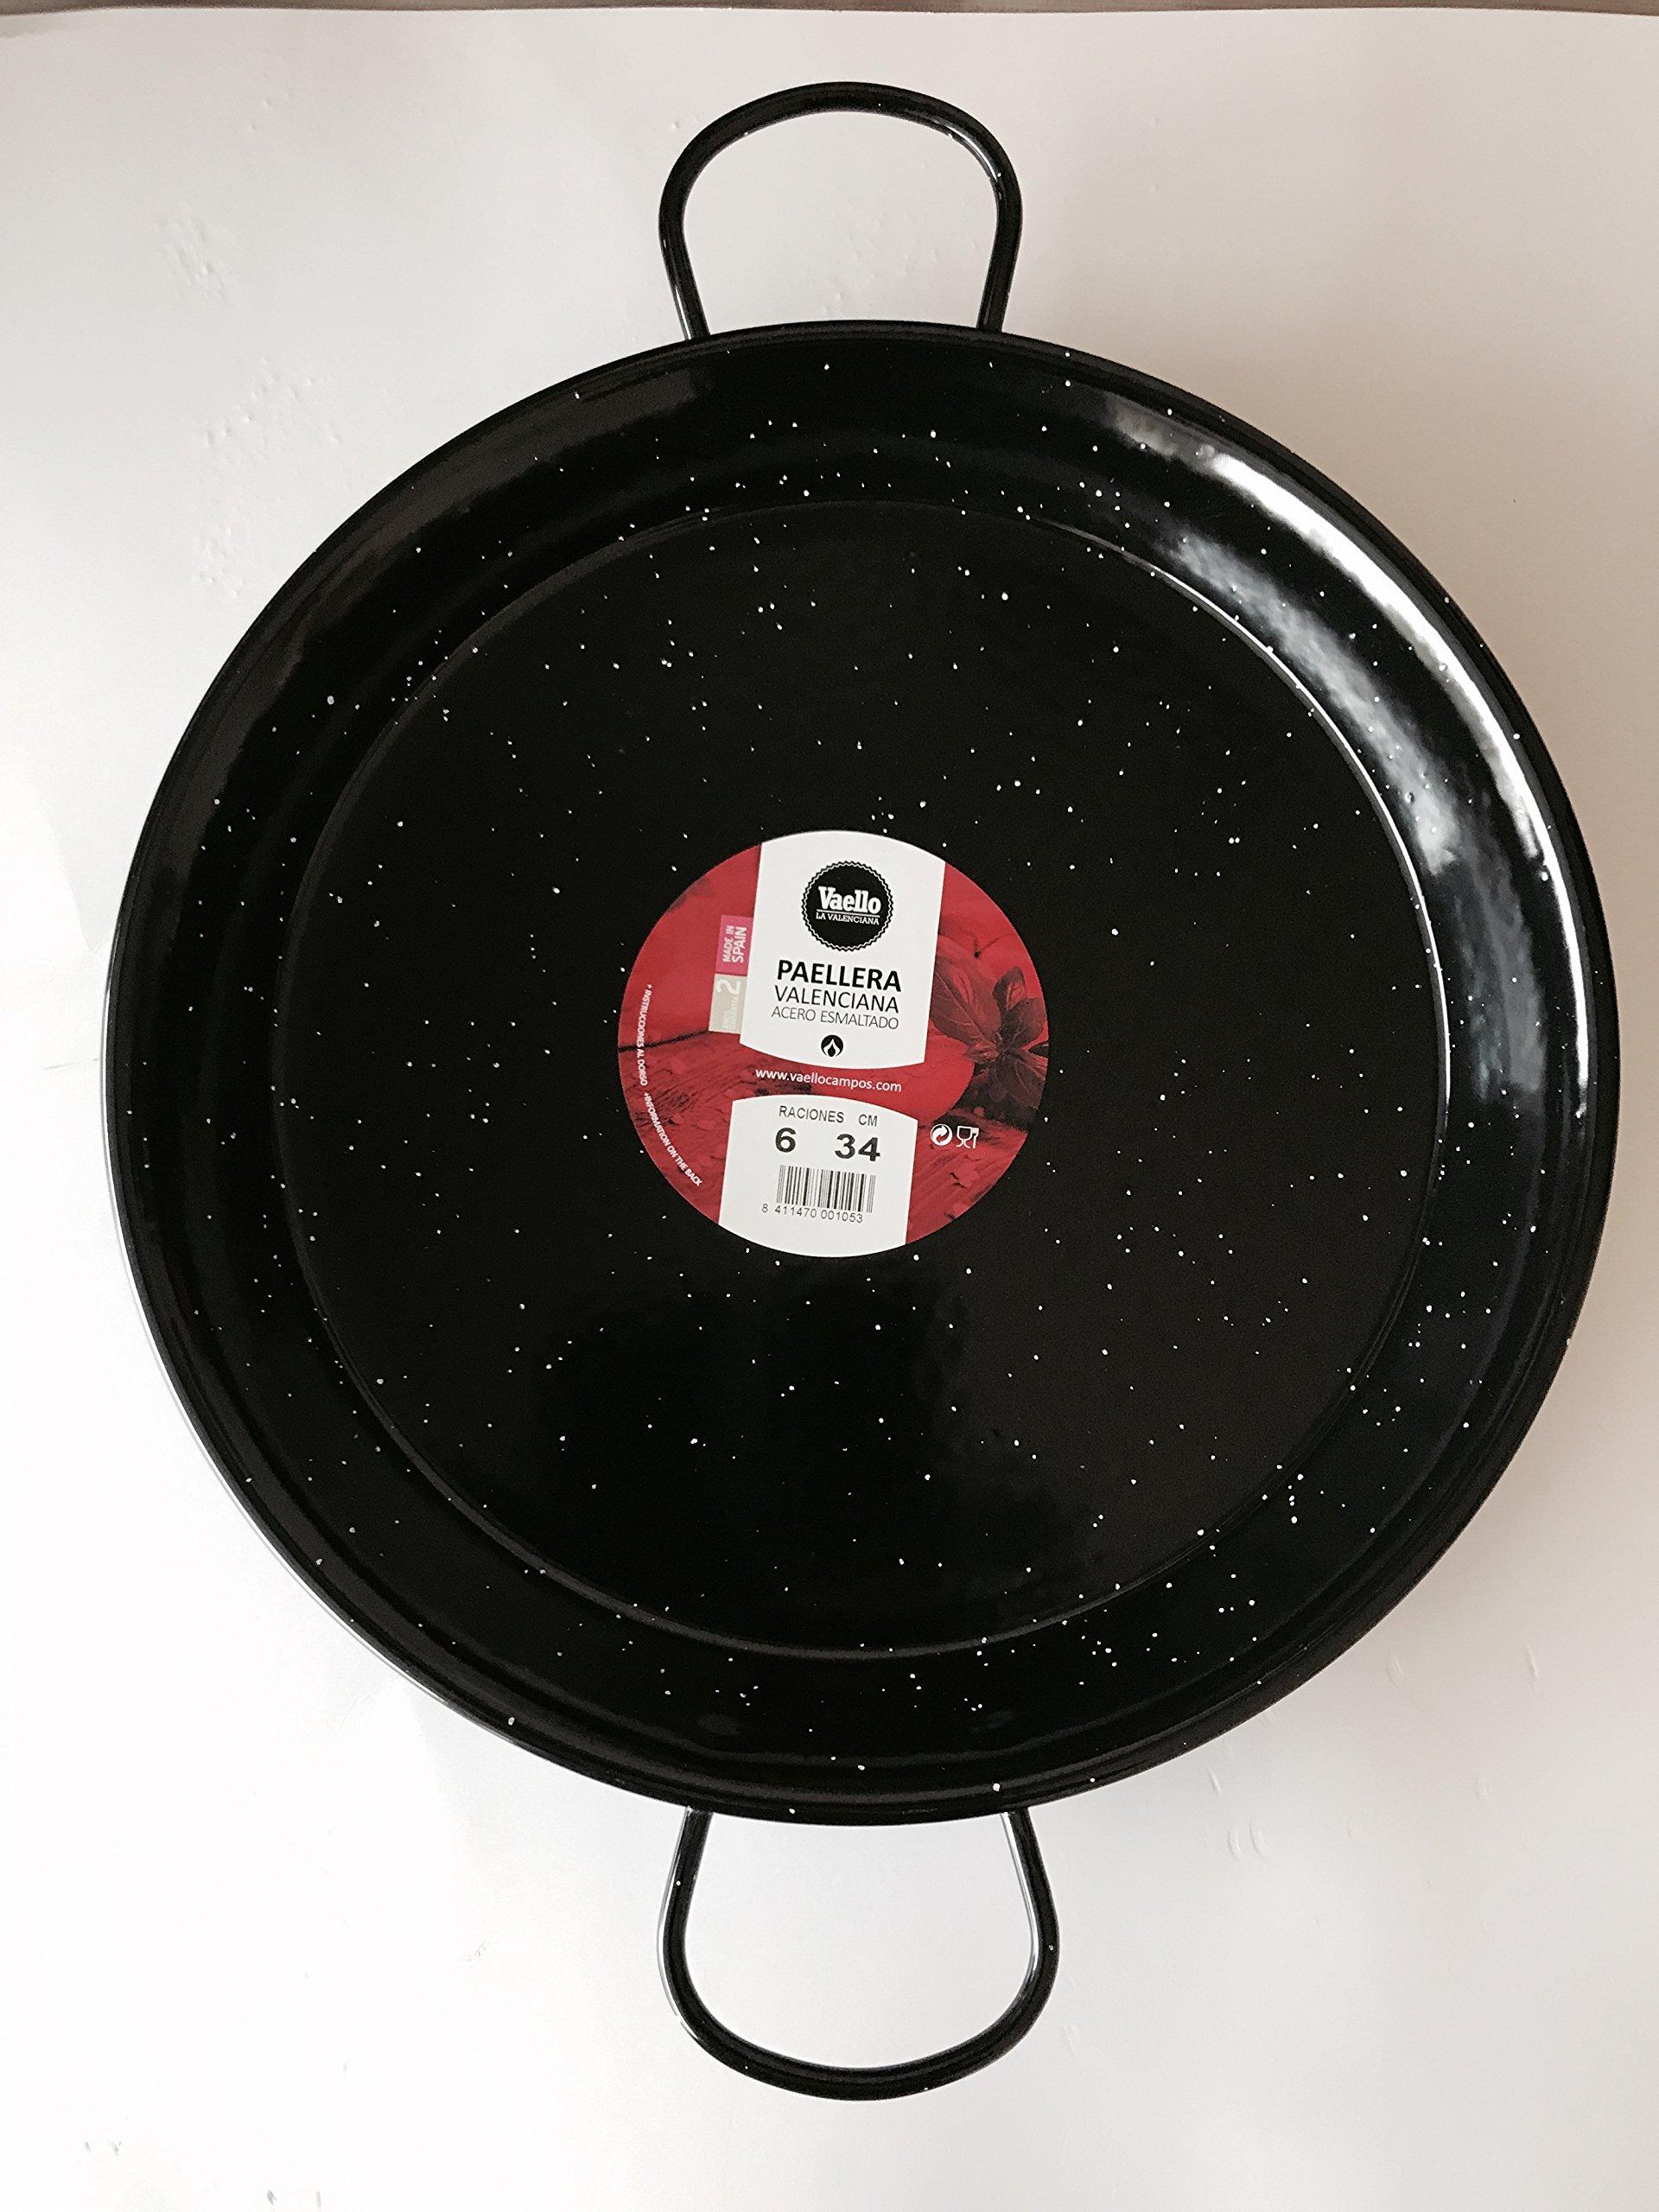 Enamelled Steel Valencian paella pan. 14Inch / 34cm / 6 Servings